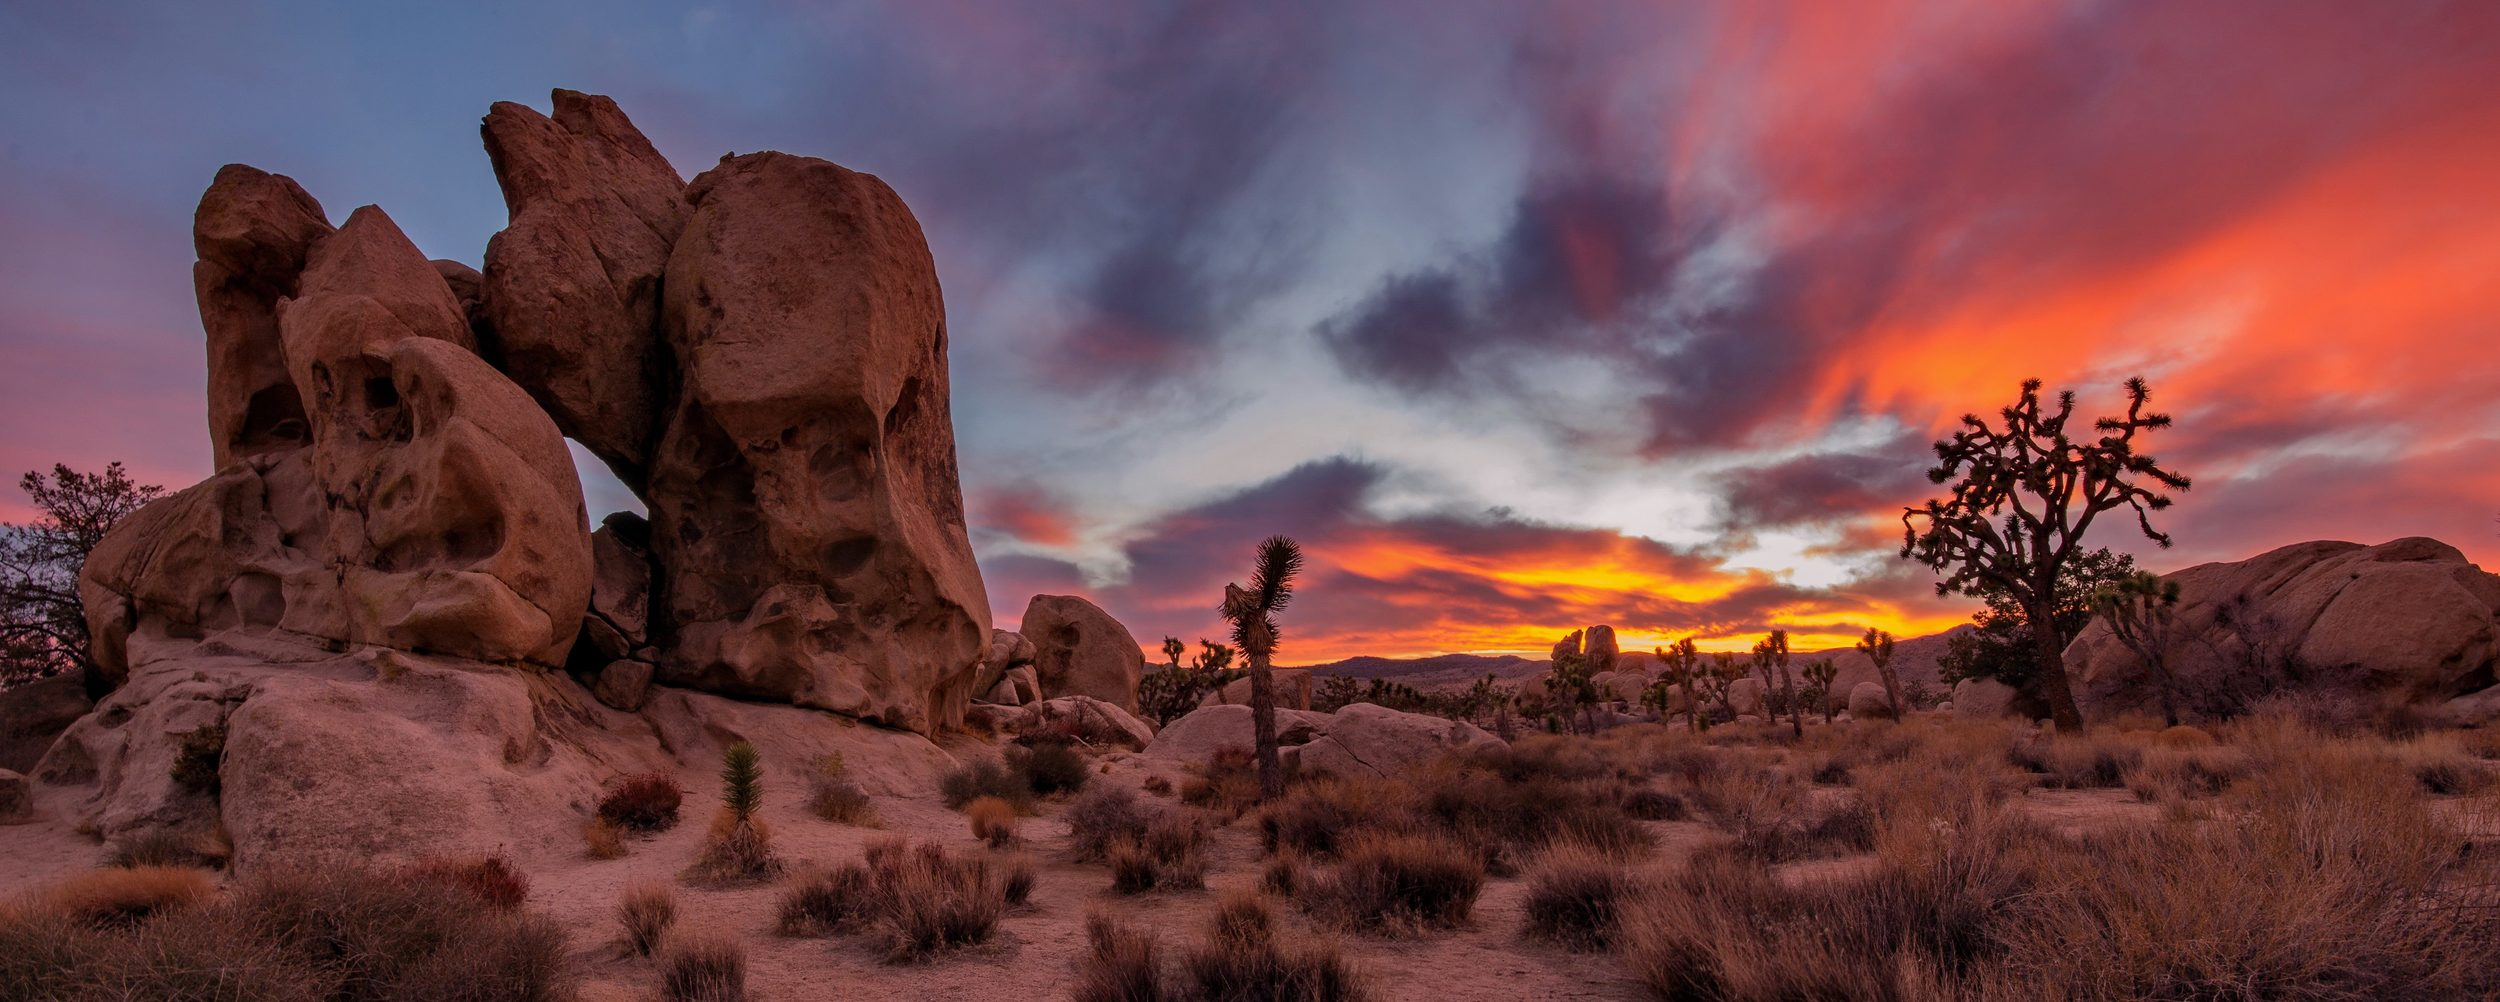 Joshua Tree National Park At Sunset (Photo: Namolik Design and Photography/Shutterstock)